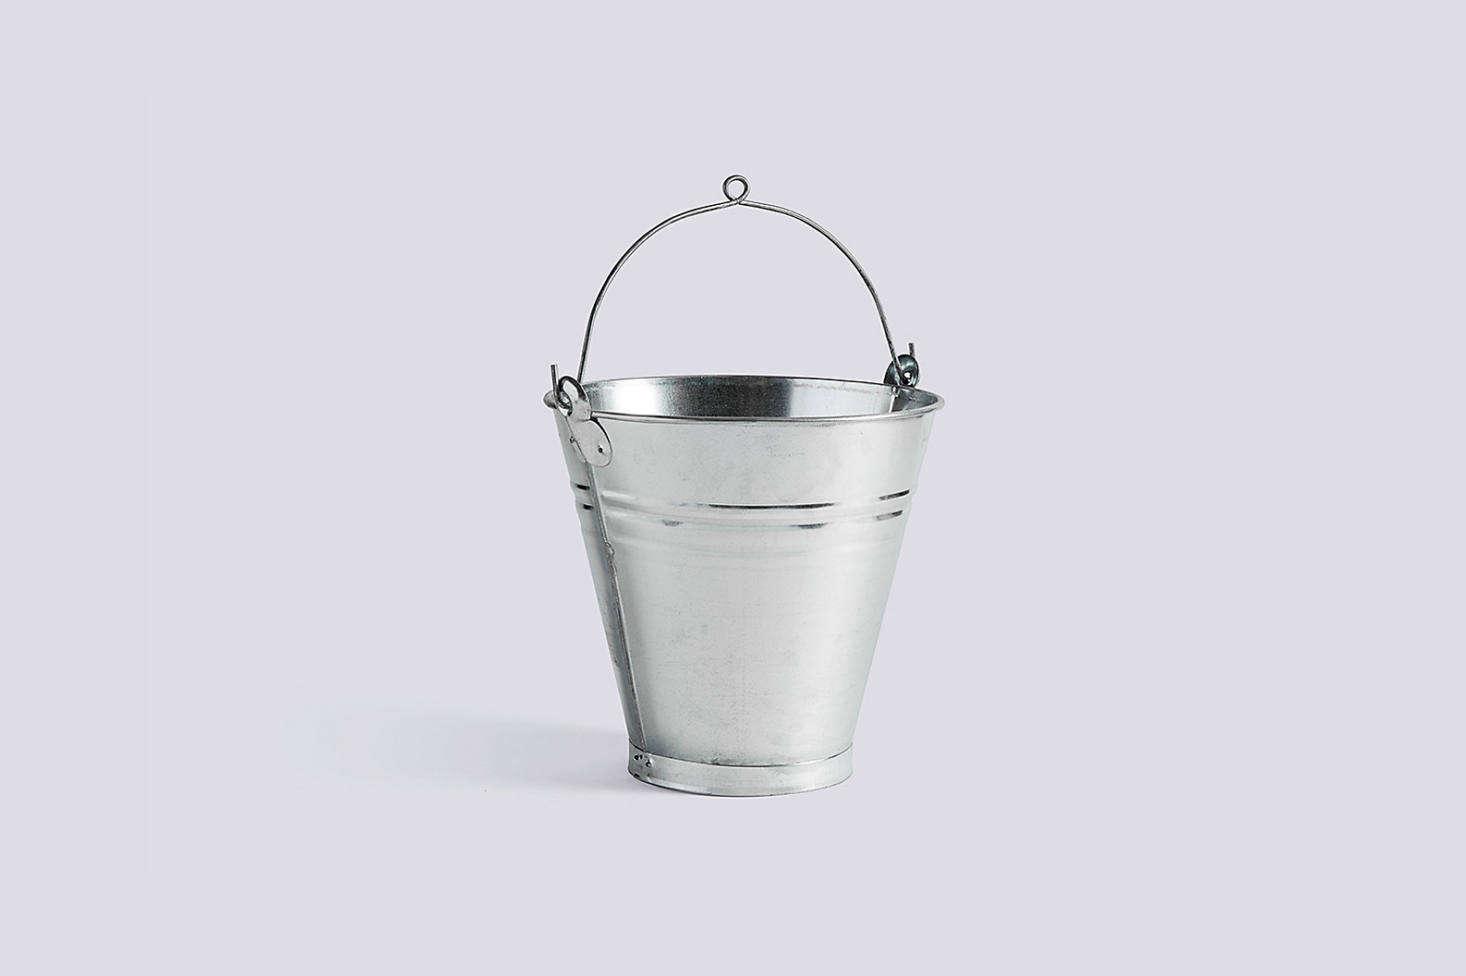 The Turkish Handmade Bucket made of galvanized iron is $.